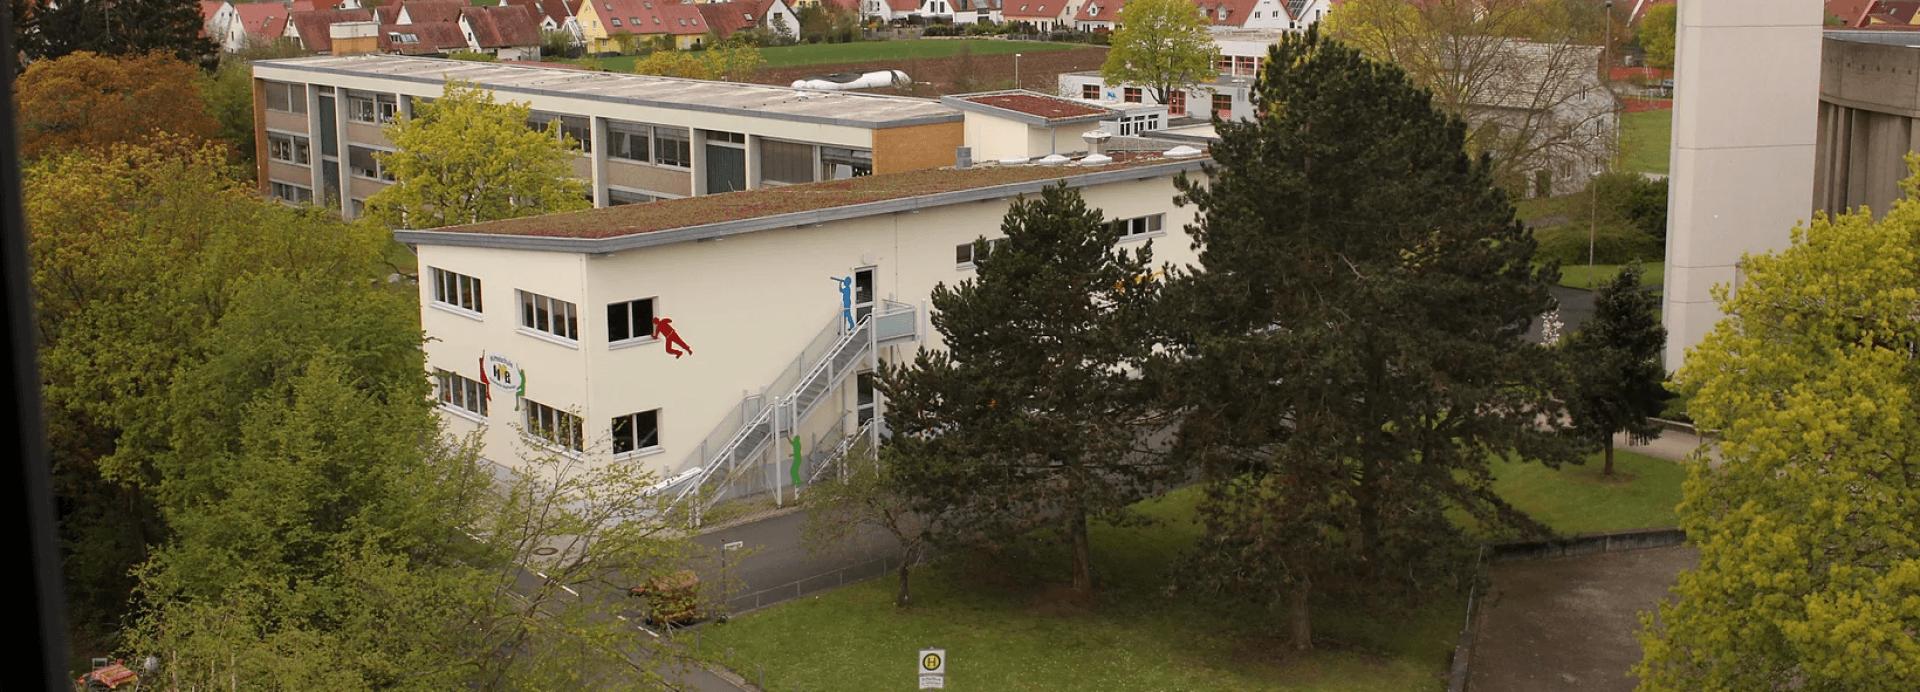 Mittelschule Holderhecke Bergrheinfeld